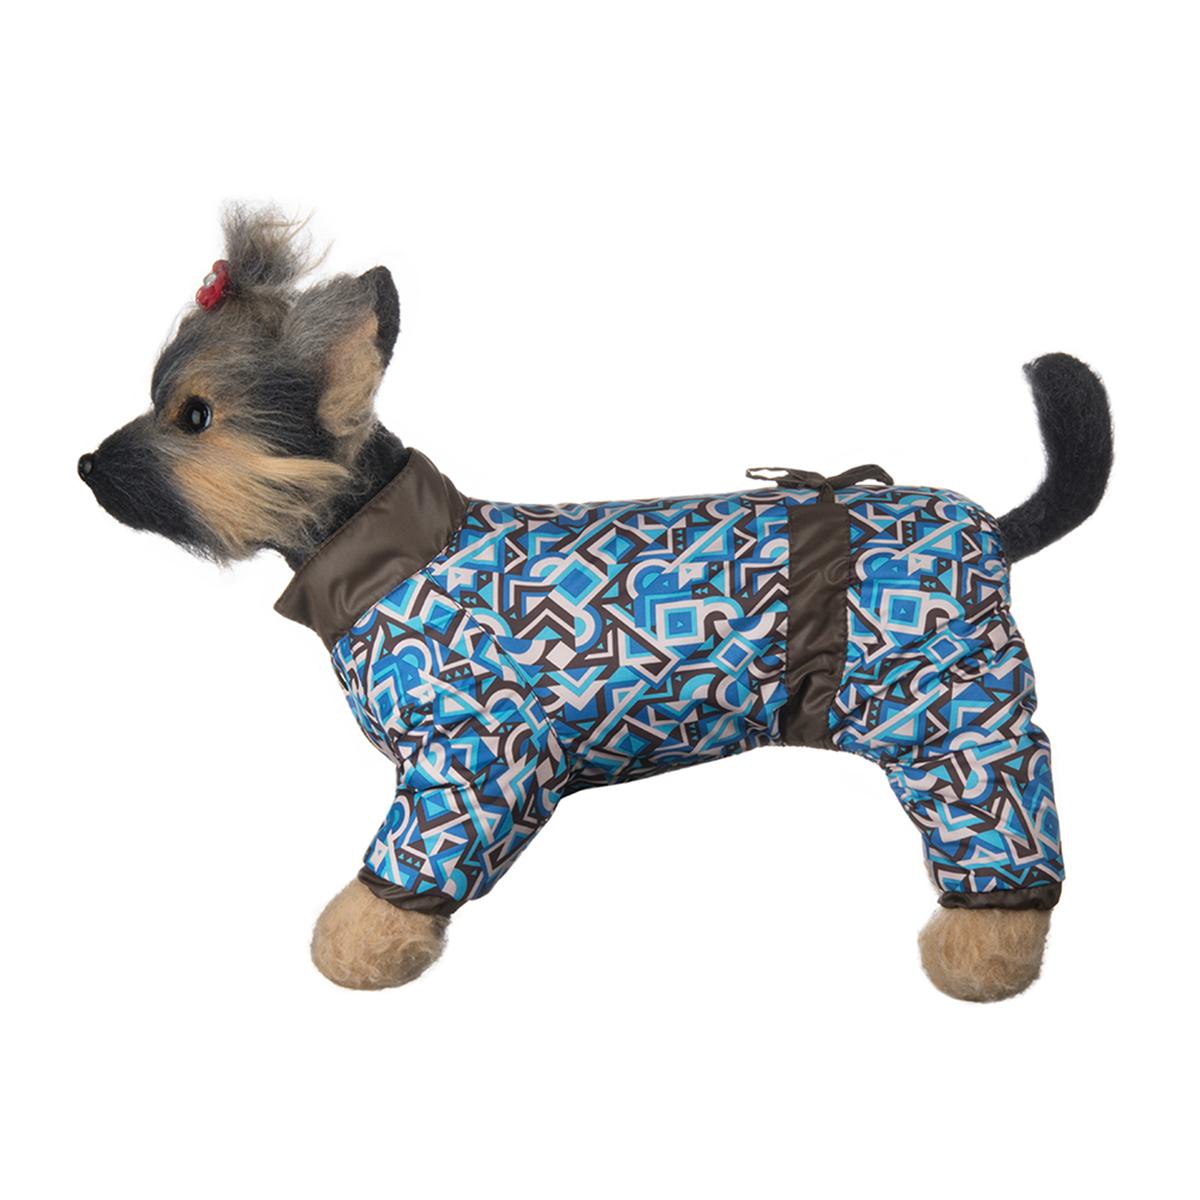 Комбинезон для собак Dogmoda Норд, зимний, унисекс, цвет: коричневый, бежевый, голубой. Размер 4 (XL)